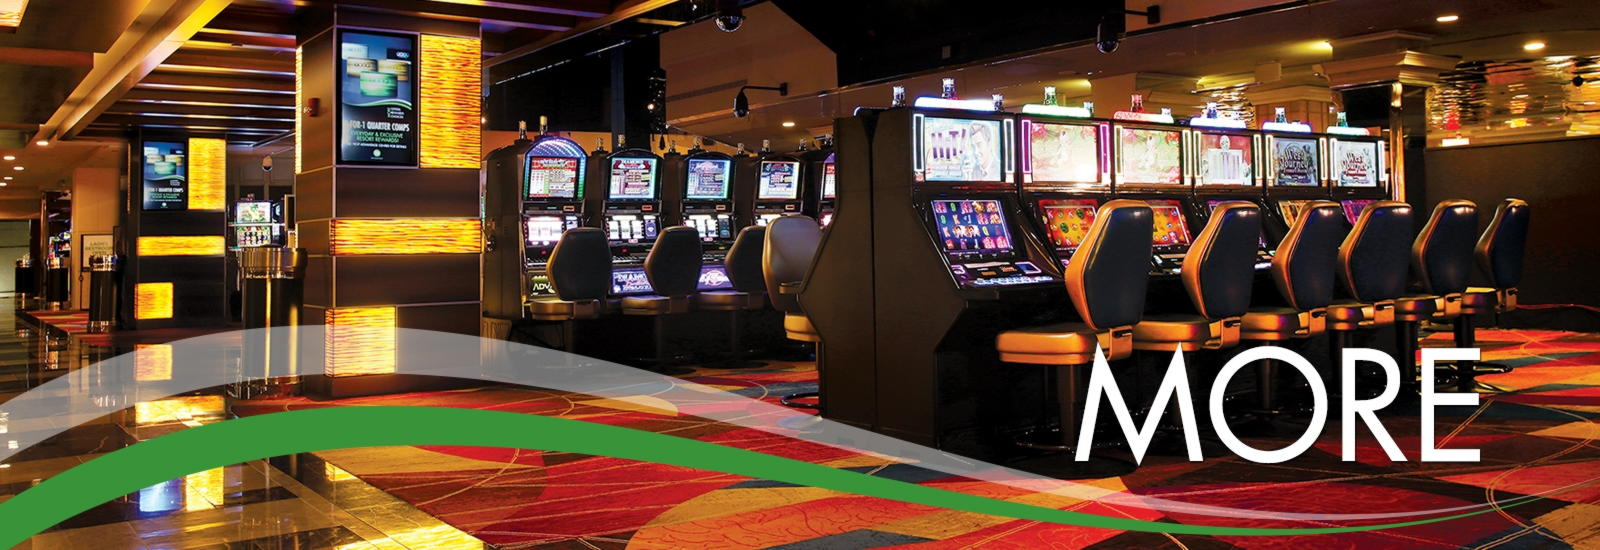 975% Signup casino bonus at Bet Tilt